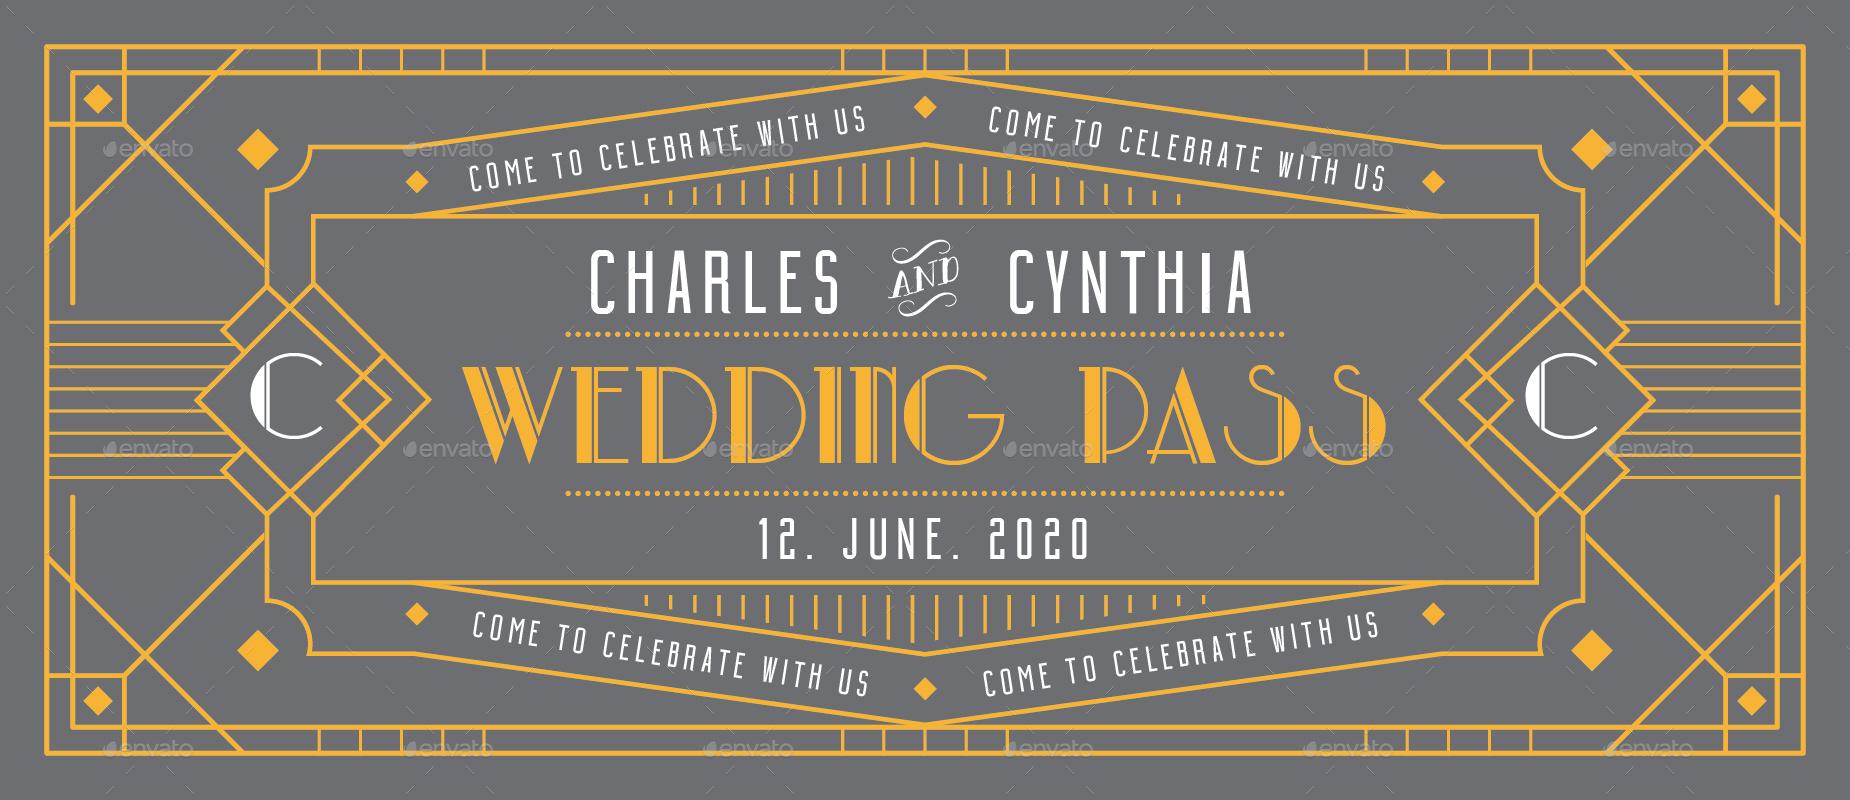 Art deco wedding invitation ticket card by totemdesigns graphicriver image set07wedding invitation ticketfrontgreyg stopboris Gallery